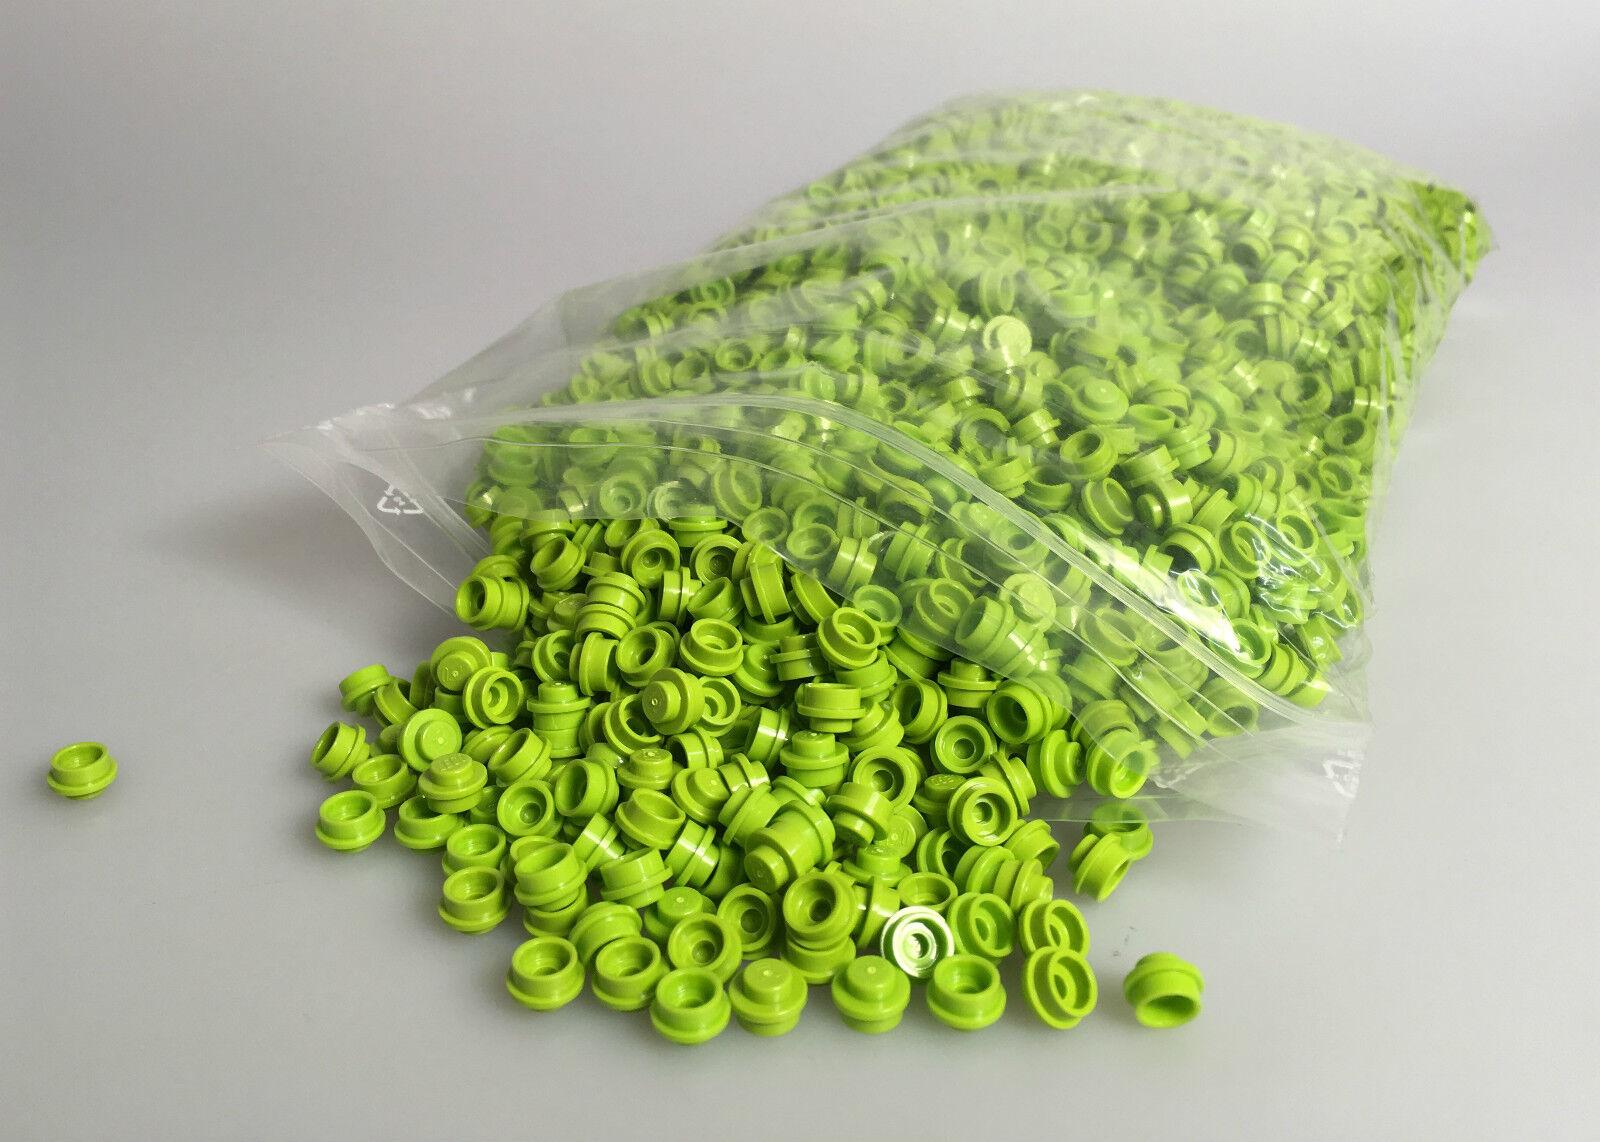 LEGO® Neuware 3000x Runder Stein 1x1 in lime grün Grün 4073 Modular Häuser MOCs